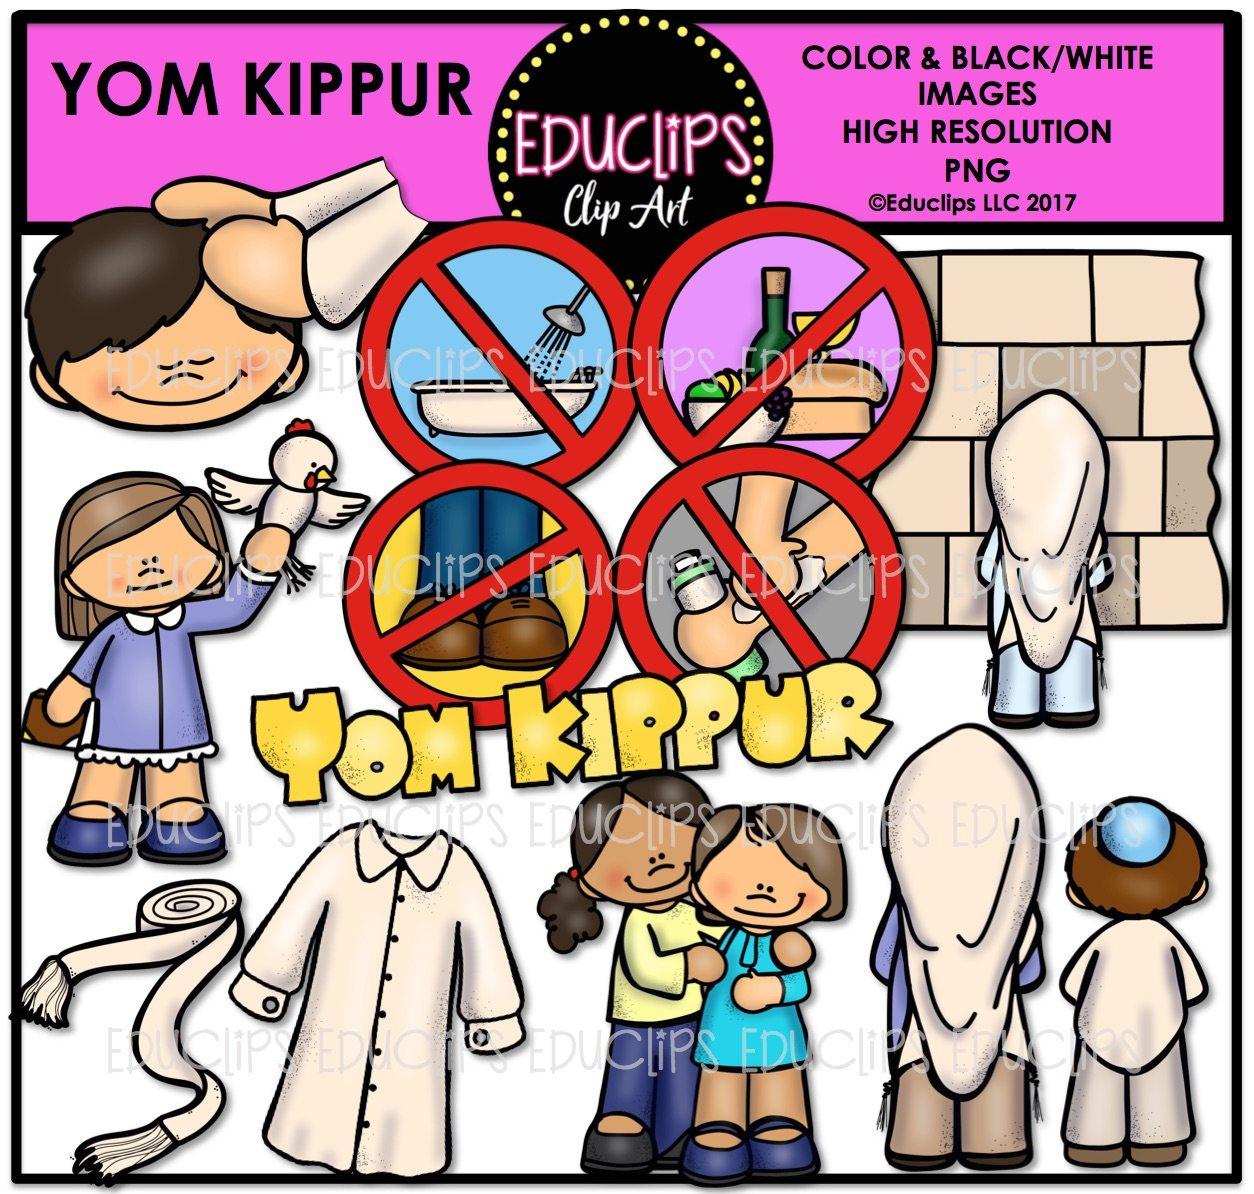 Yom kippur clipart svg Yom Kippur Clip Art Bundle (Color and B&W) svg